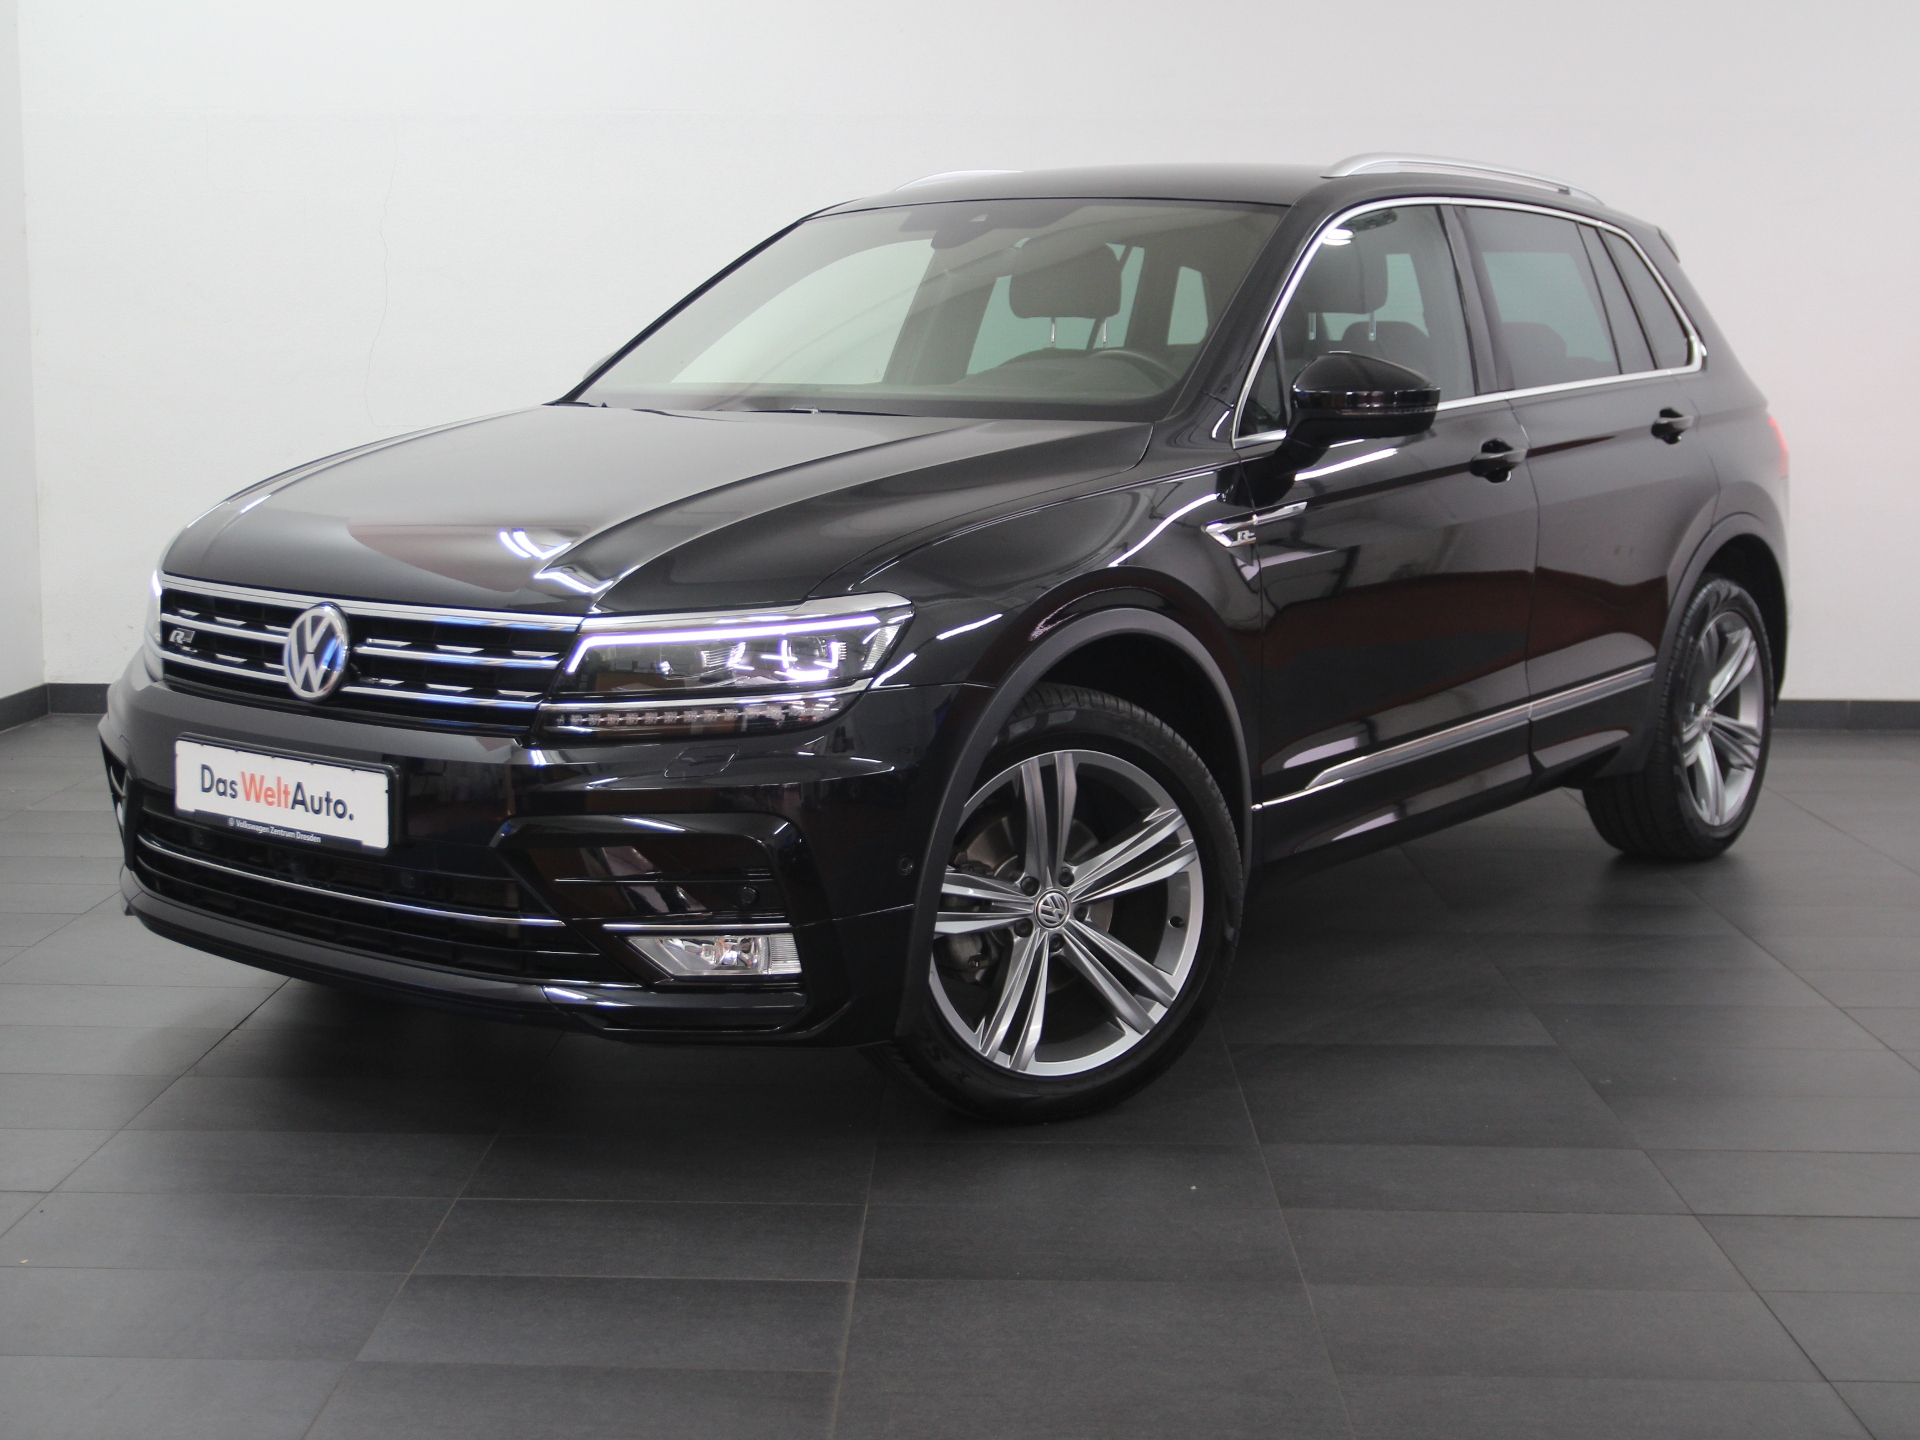 Volkswagen Tiguan Highline TDI R-LINE LEDER AHK ab 2,99%, Jahr 2017, Diesel